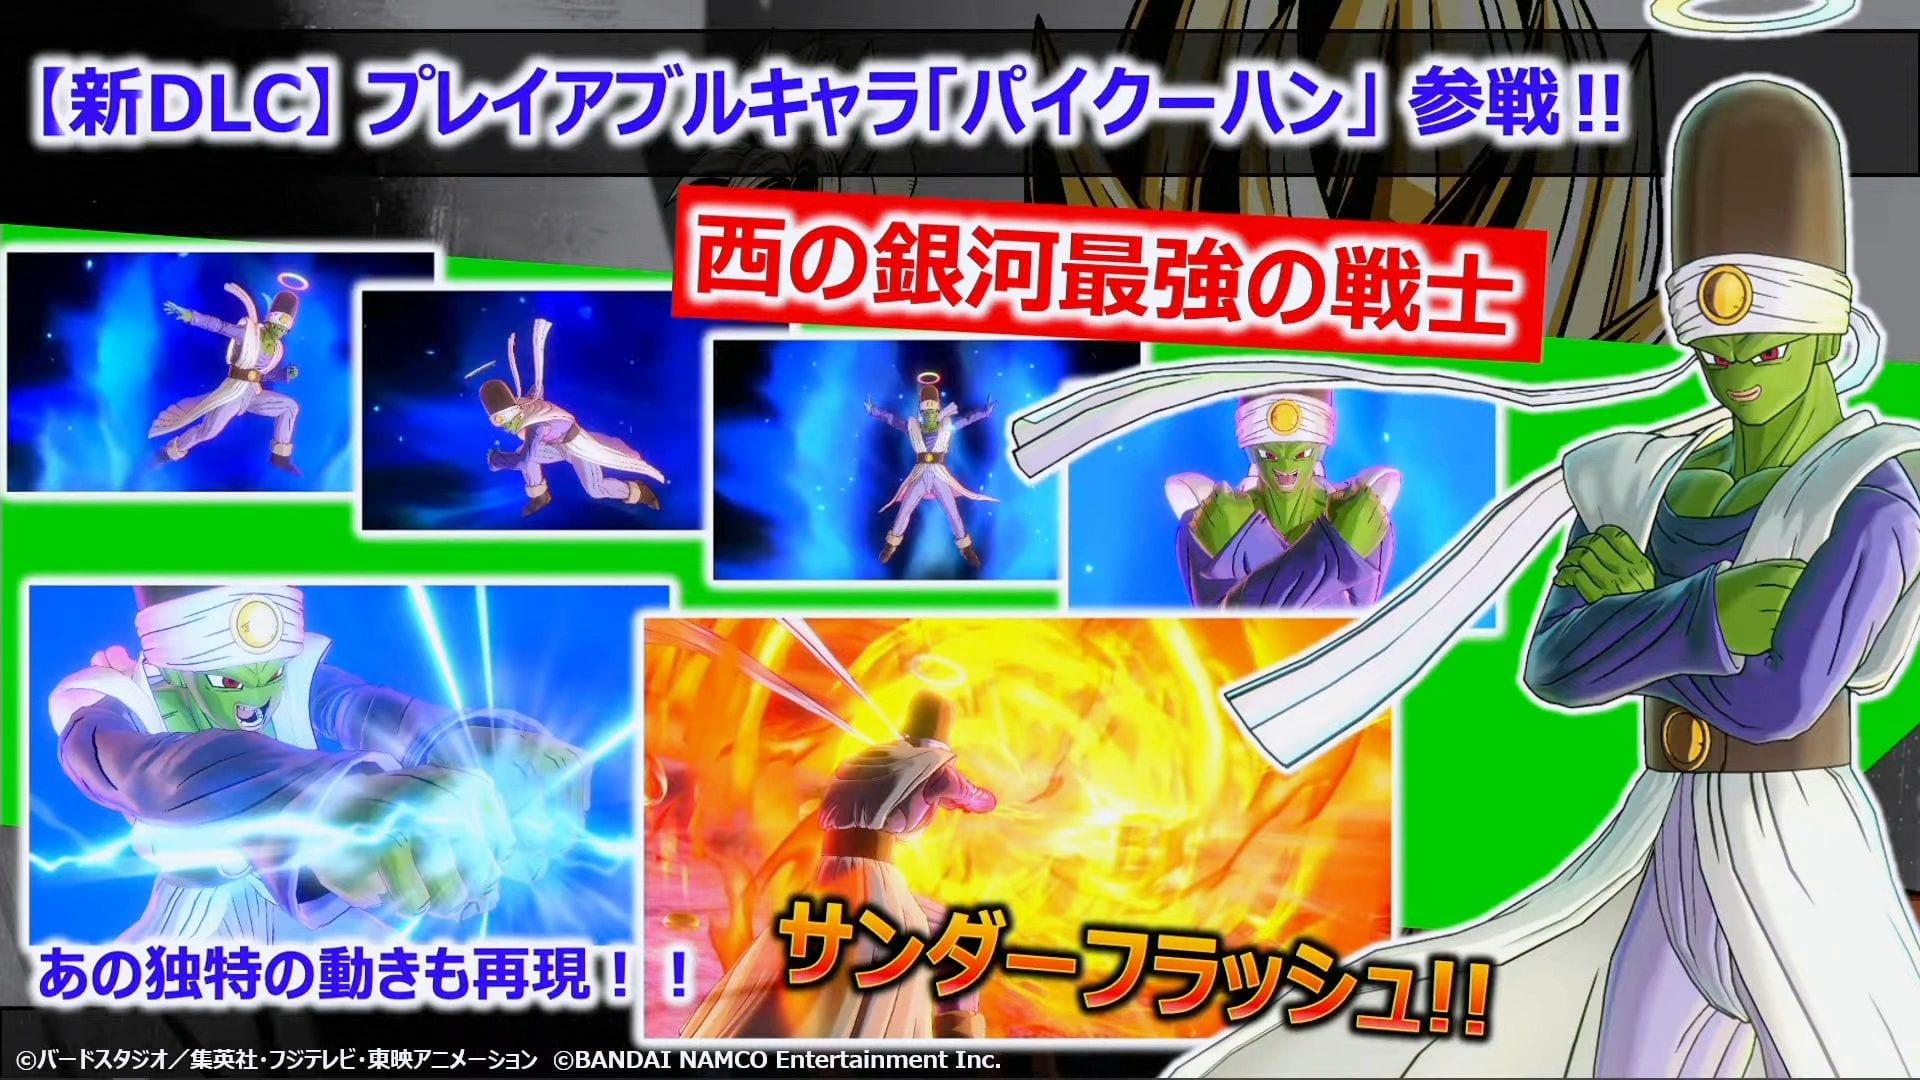 Dragon Ball Xenoverse 2 Reveals Paikuhan DLC & Free Replace; Has Shipped 7 Million Items 1